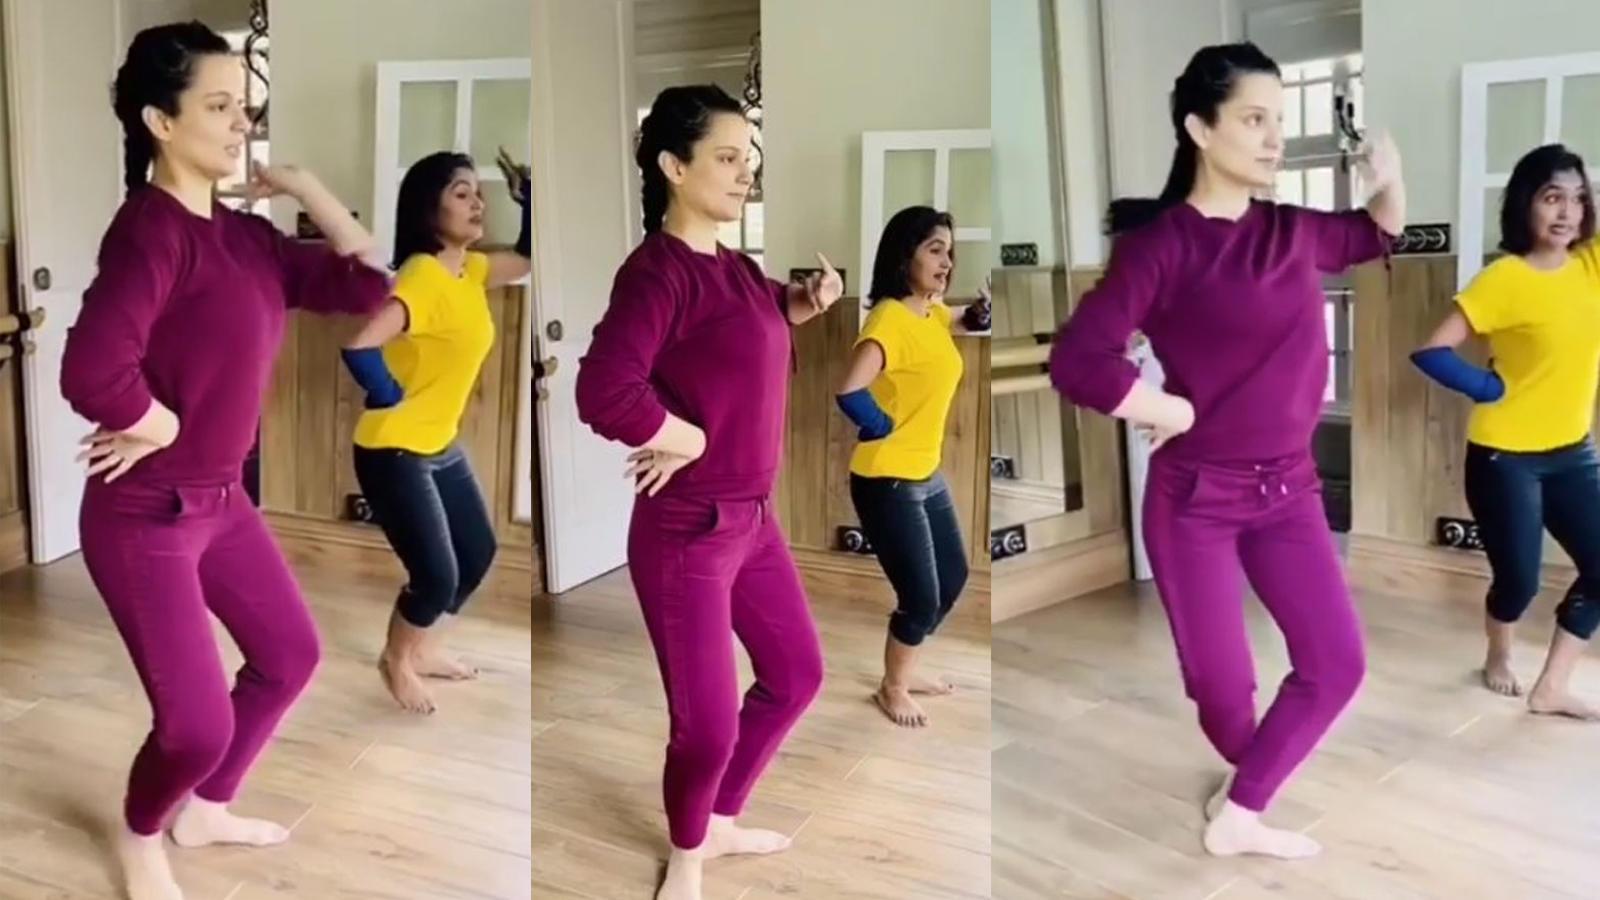 Kangana Ranaut hones dance skills for late Tamil Nadu Chief Minister Jayalalithaa's biopic at her Manali residence